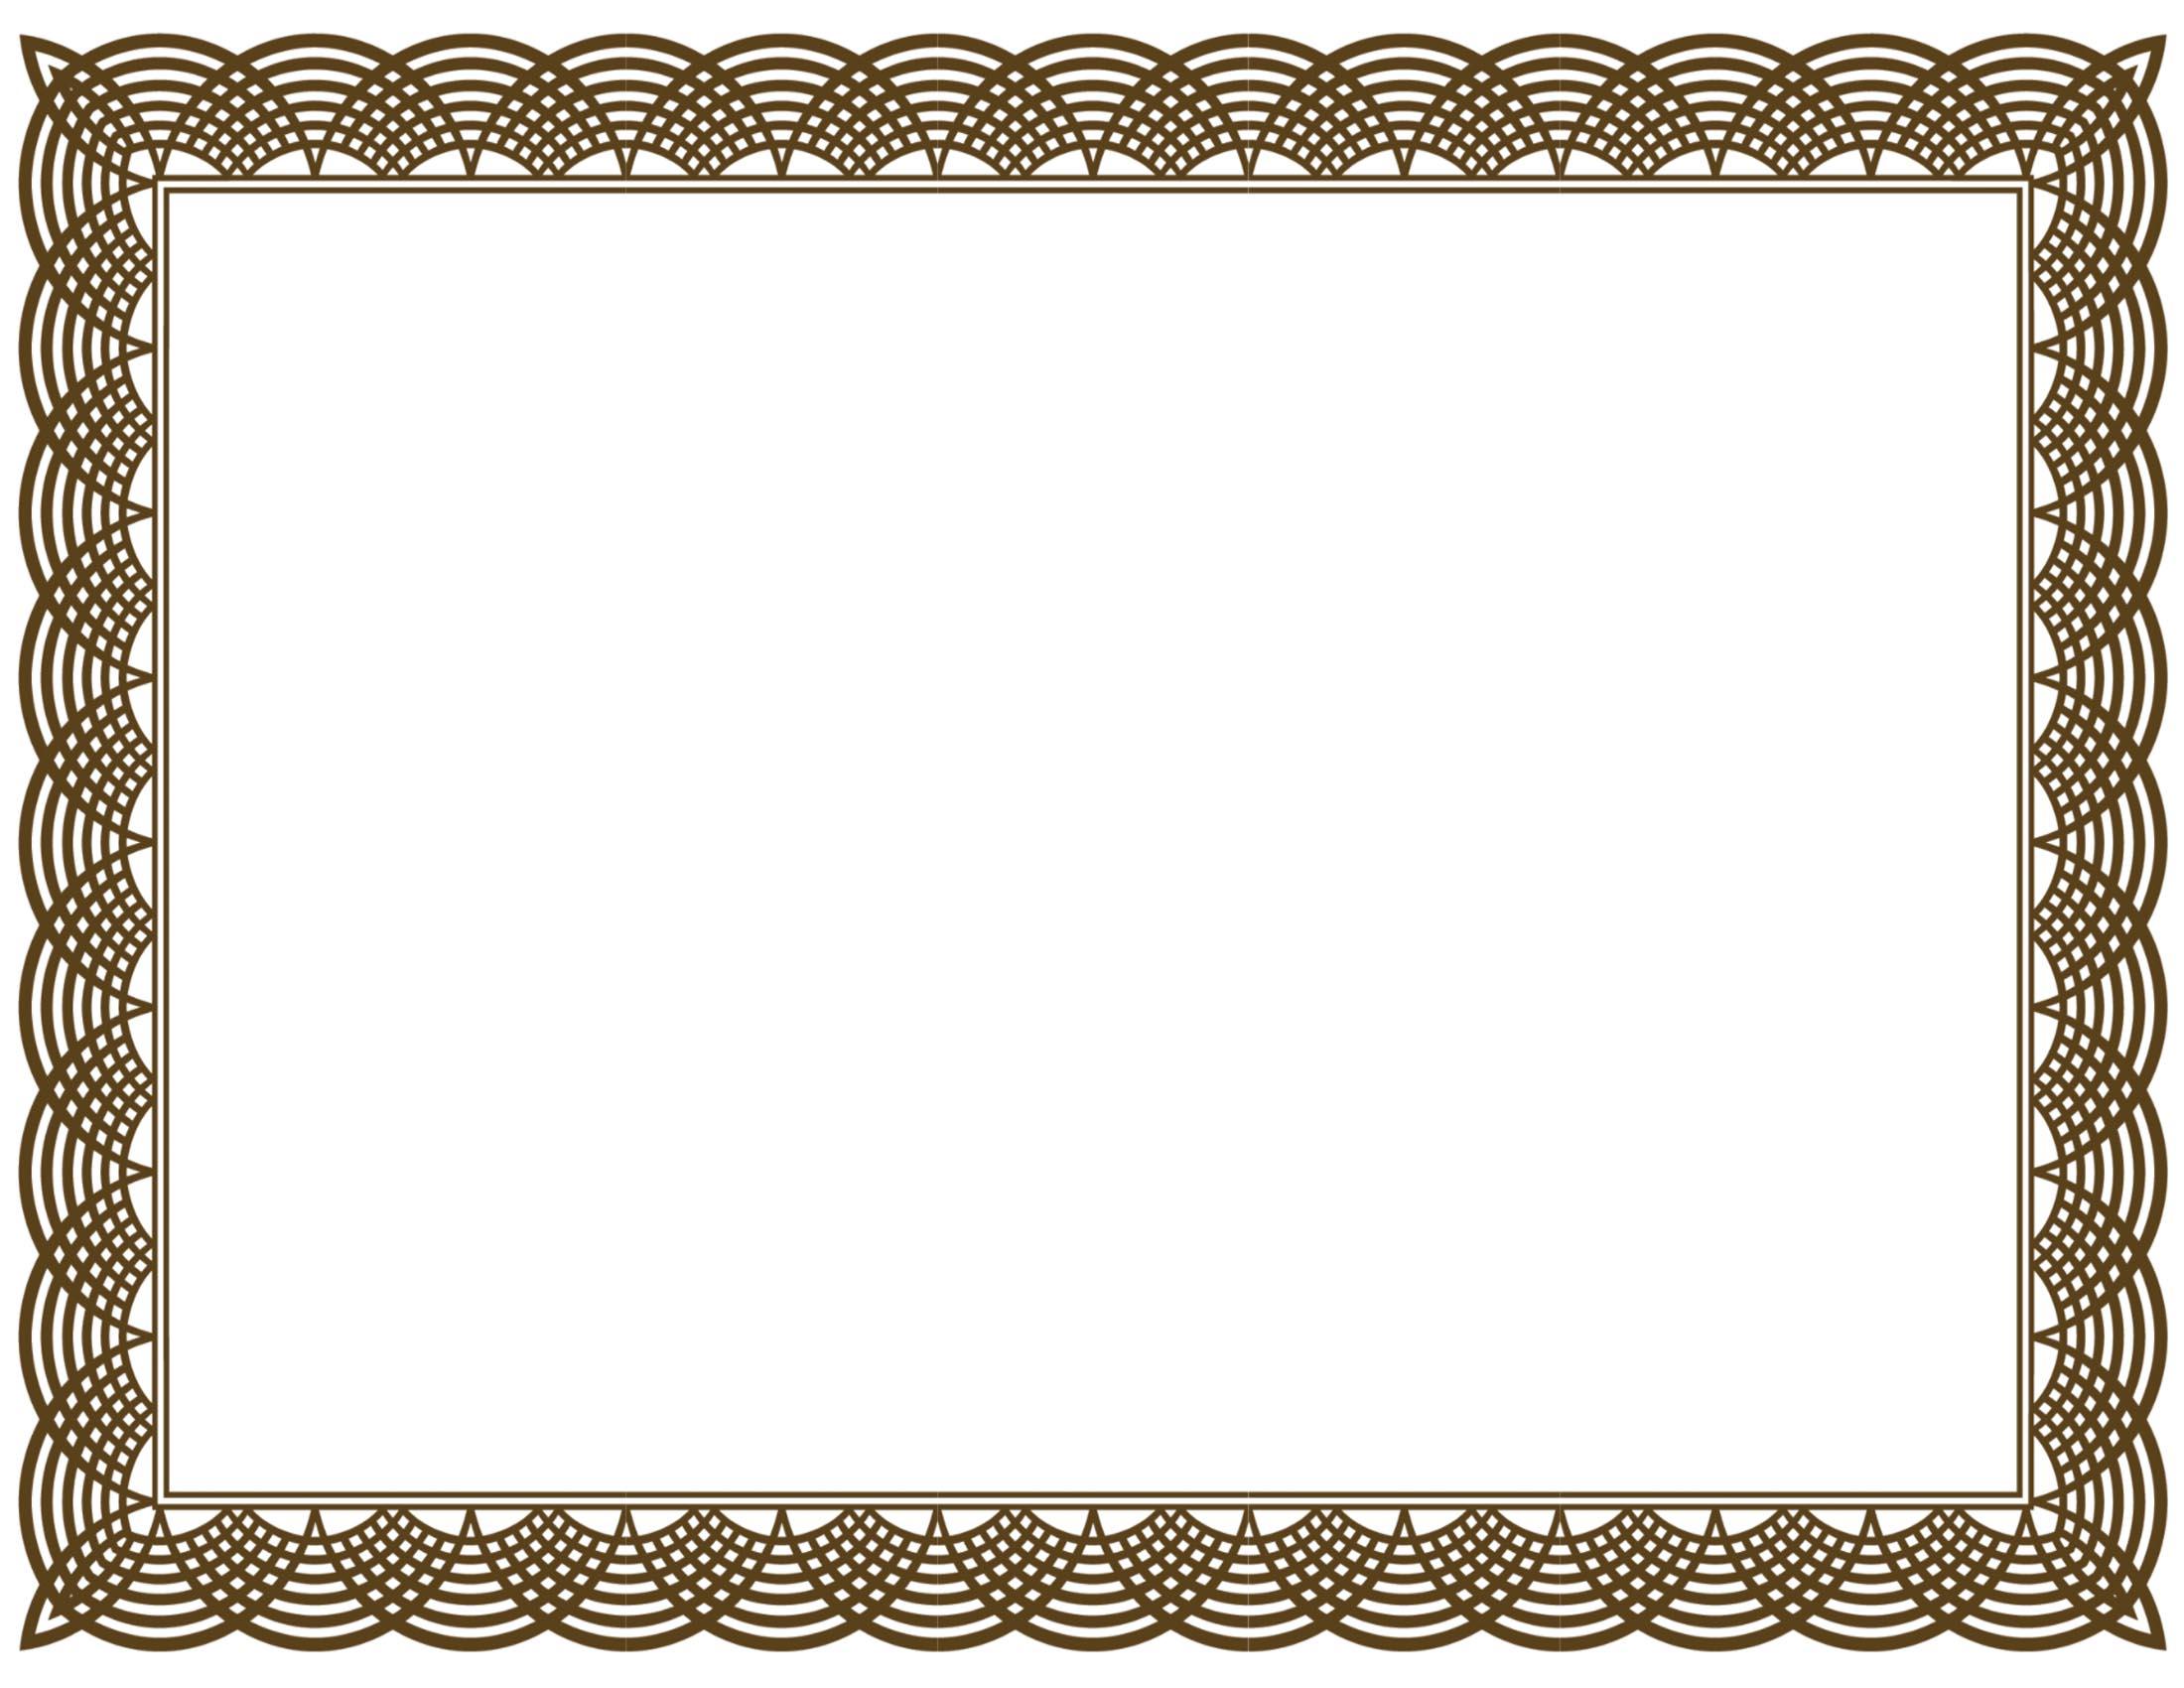 Gift certificate incep imagine. Award clipart borders